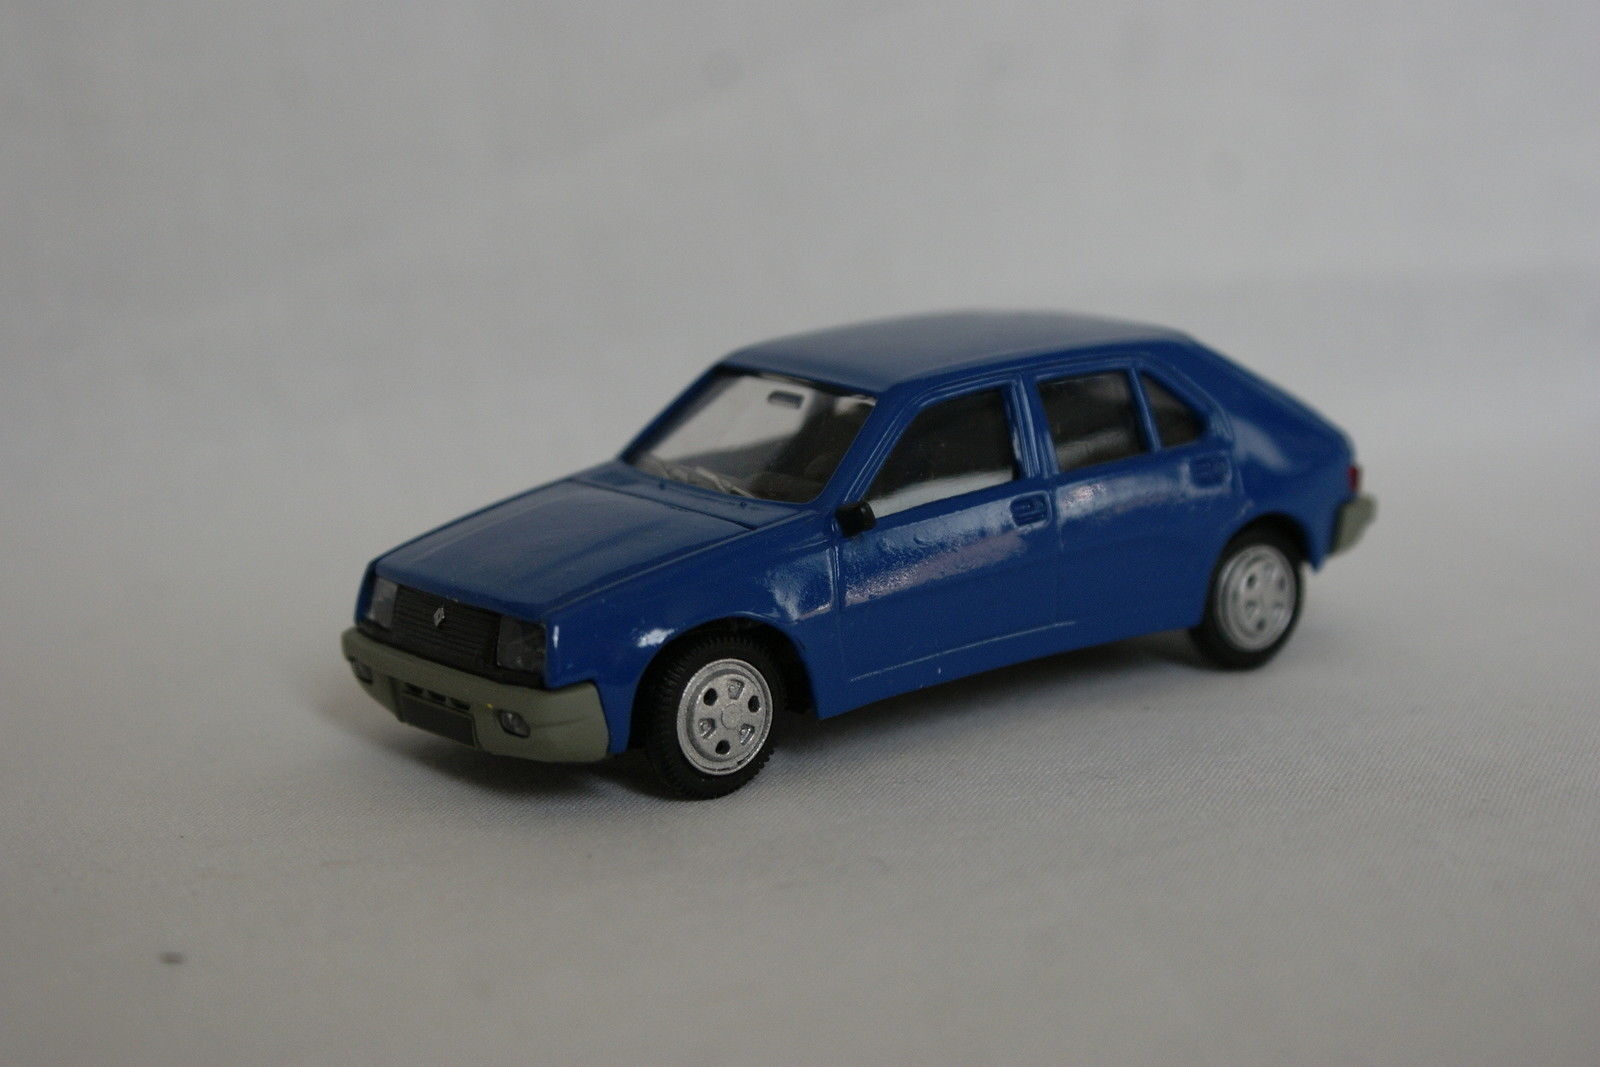 Norev SB 1 43 - - - Renault 14 bluee 955919